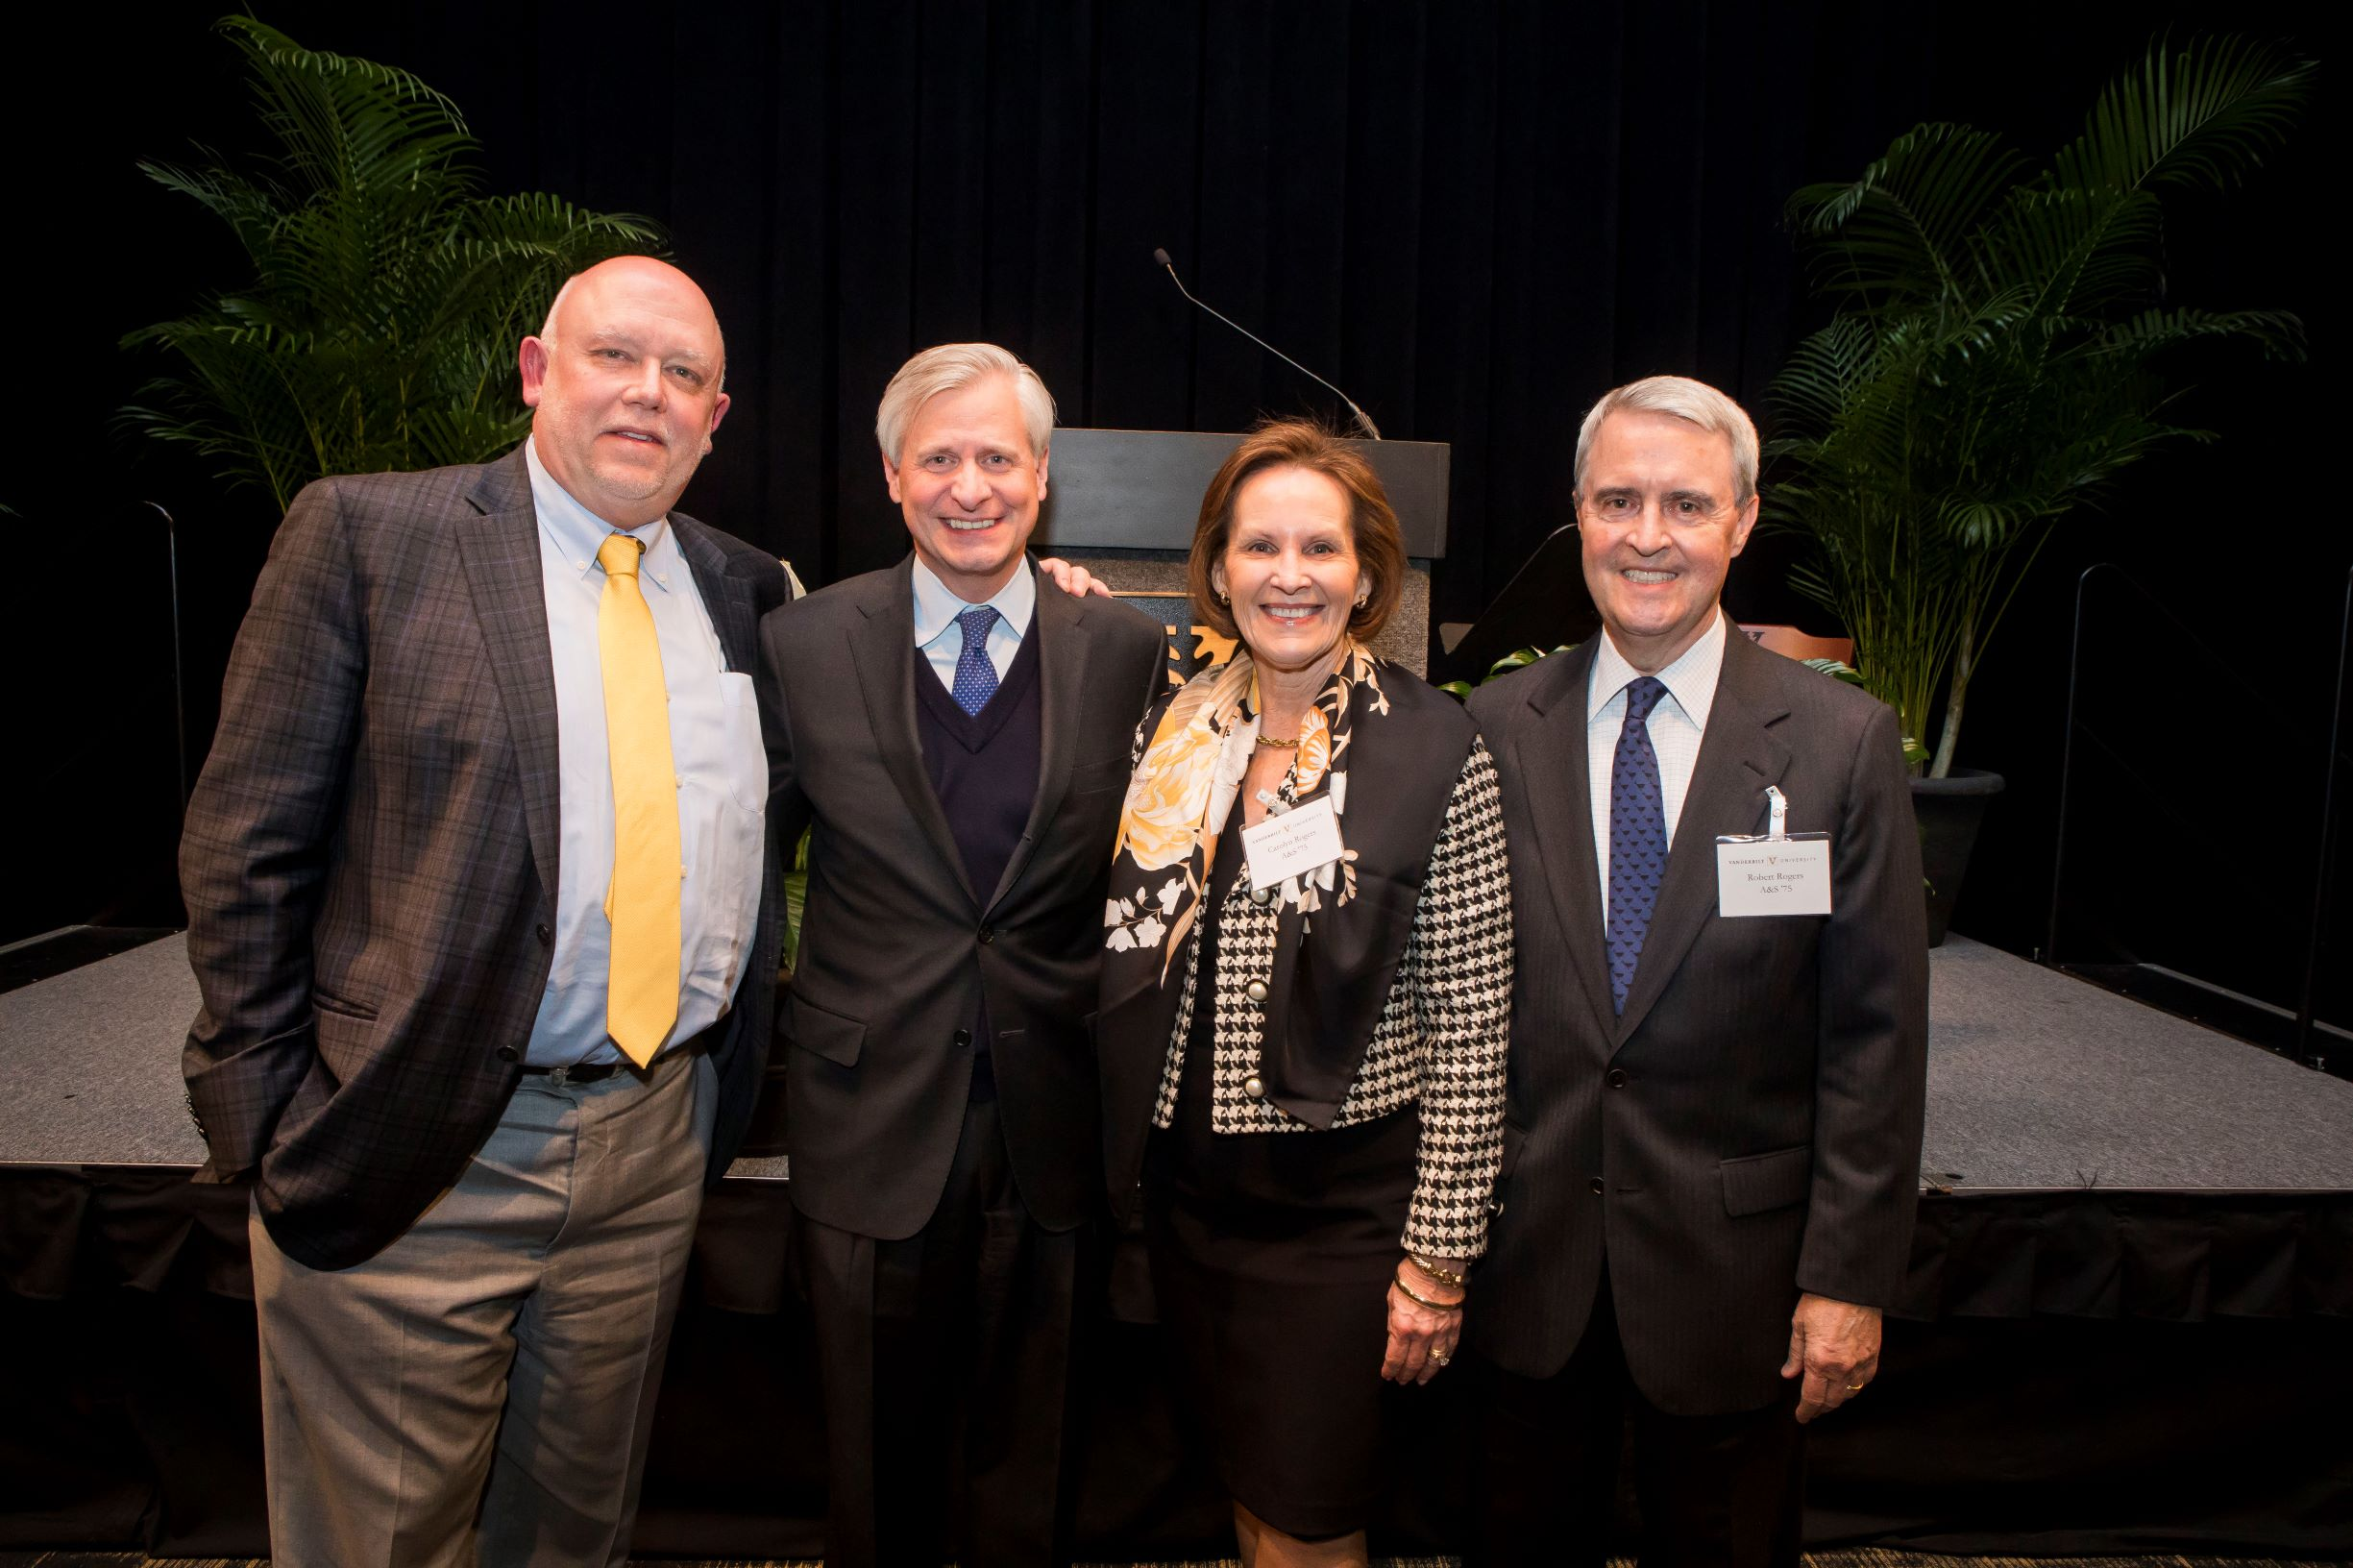 (L-r) Dean John G. Geer, Professor Jon Meacham, Carolyn T. Rogers and Robert M. Rogers in 2019.